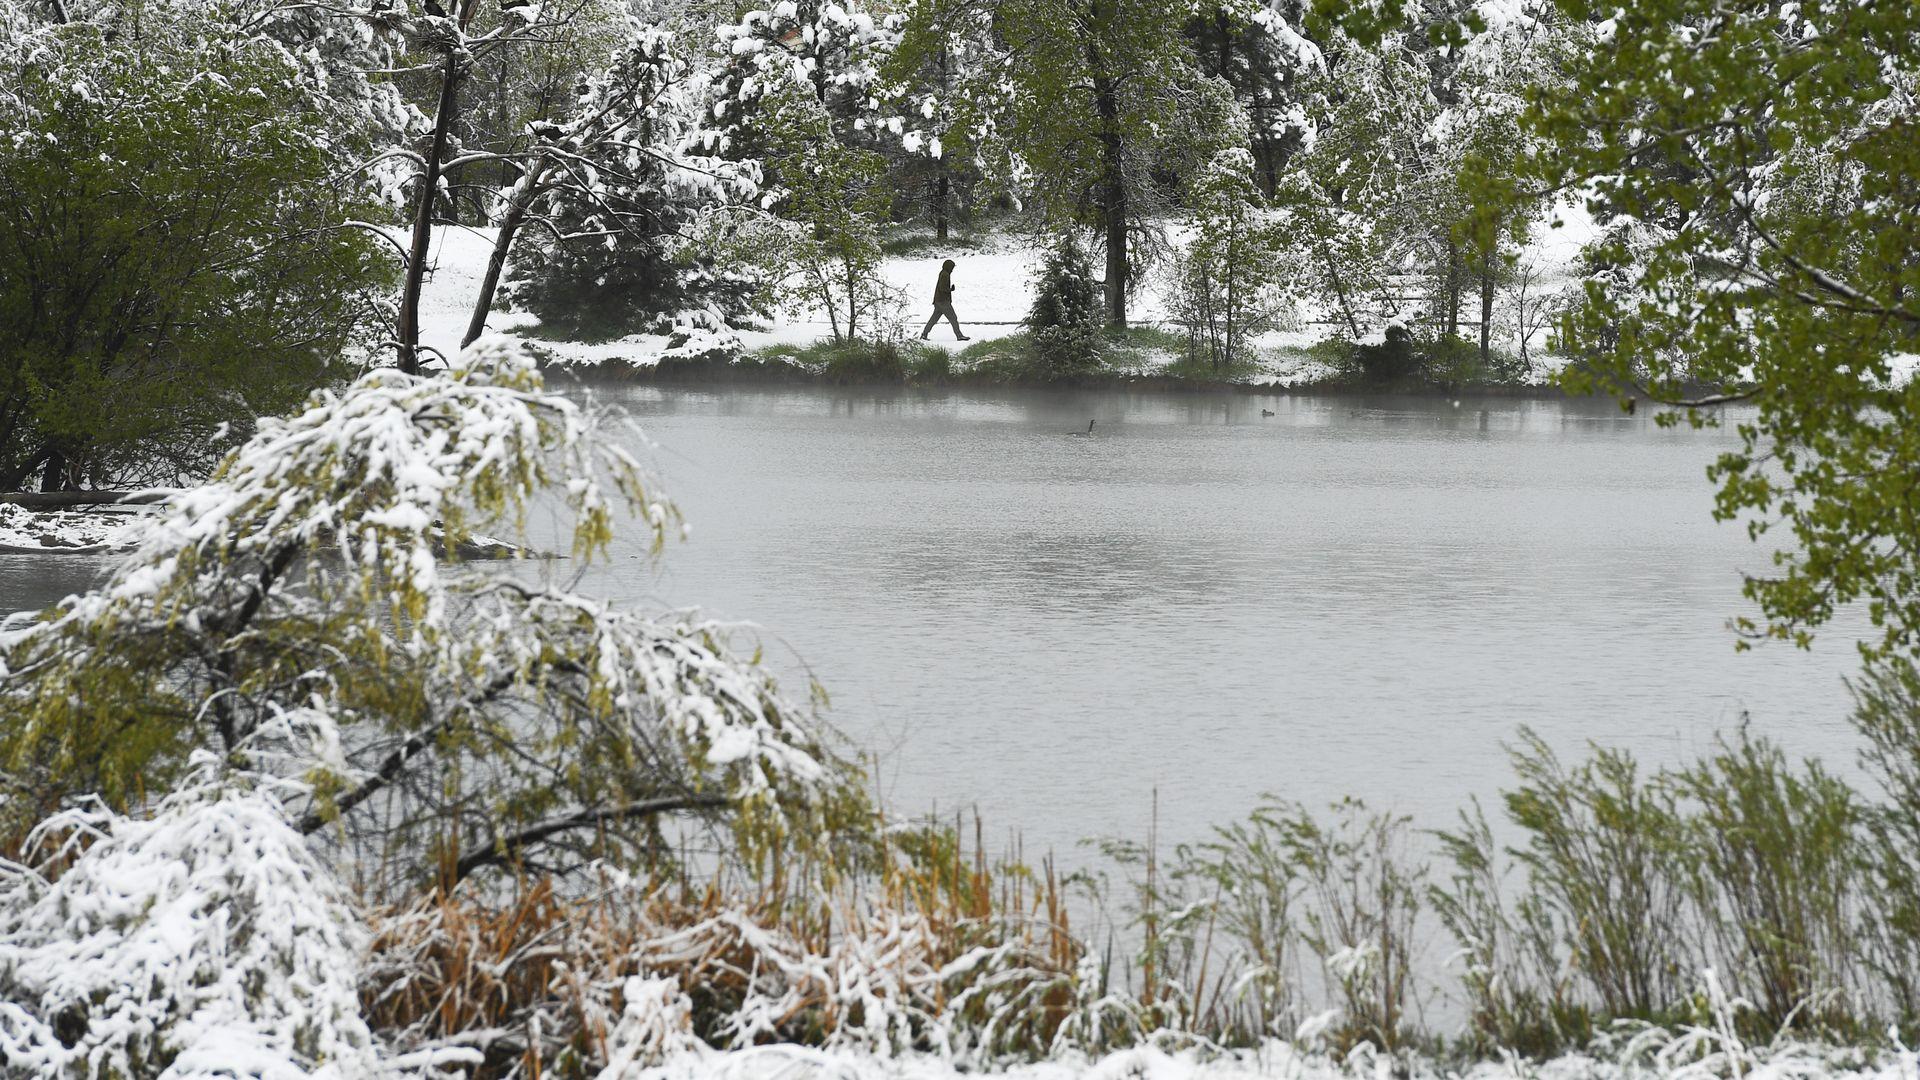 Snow on trees around a lake